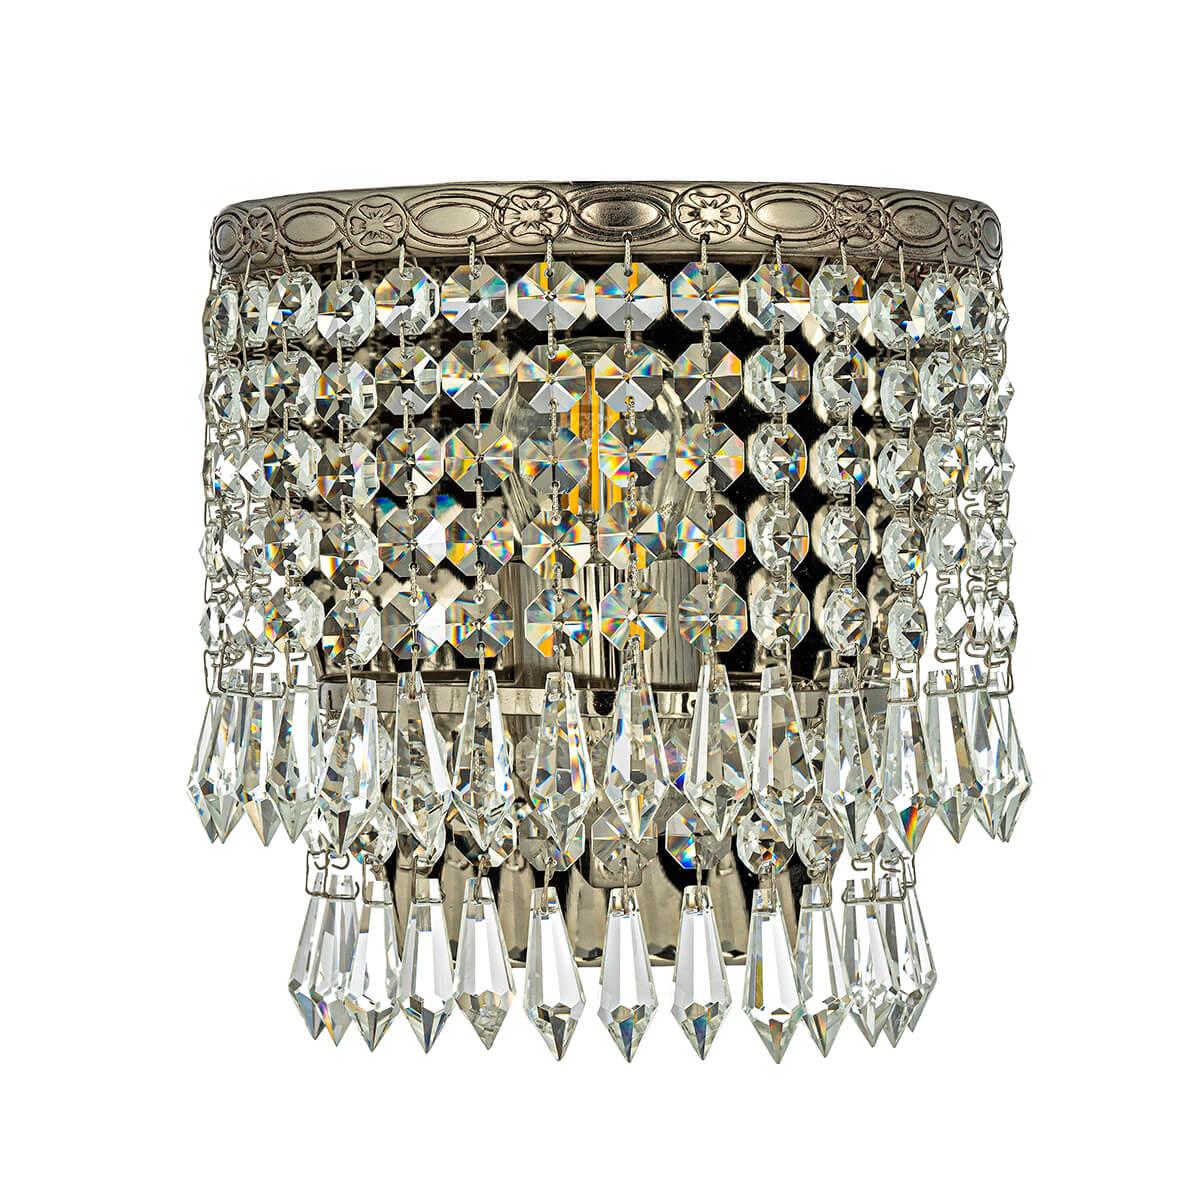 Настенный светильник Arti Lampadari Nonna E 2.10.501 N цена и фото